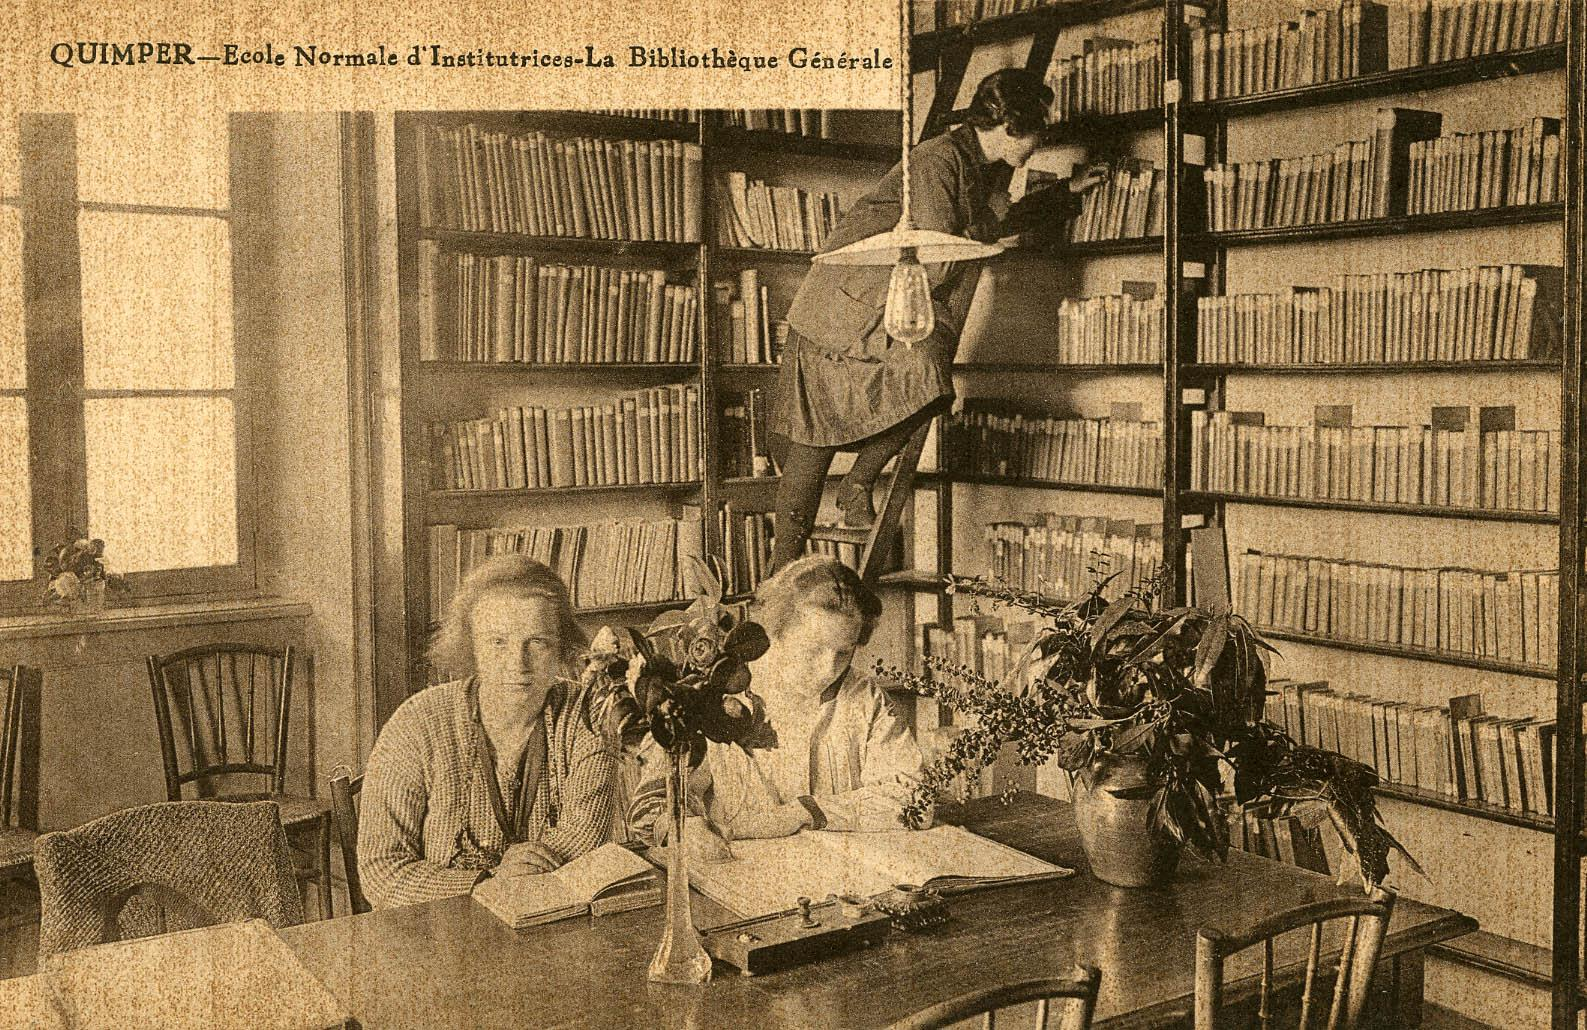 enf-bibliotheque-generale